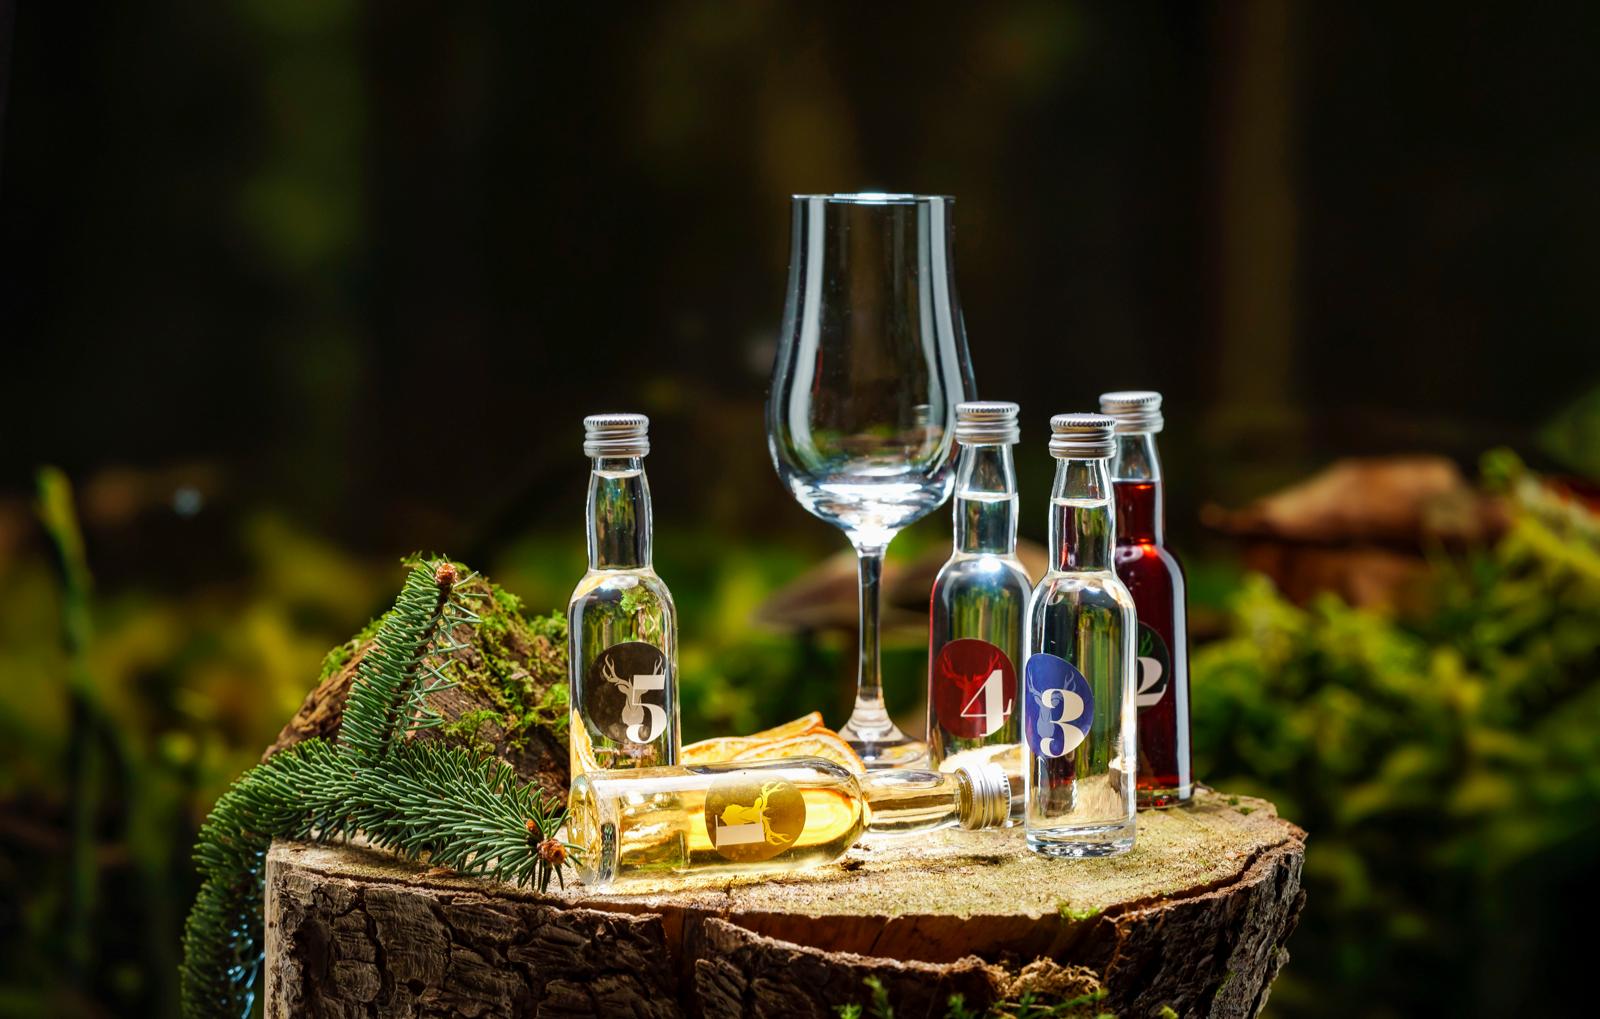 rum-tasting-freiburg-im-breisgau-bg4